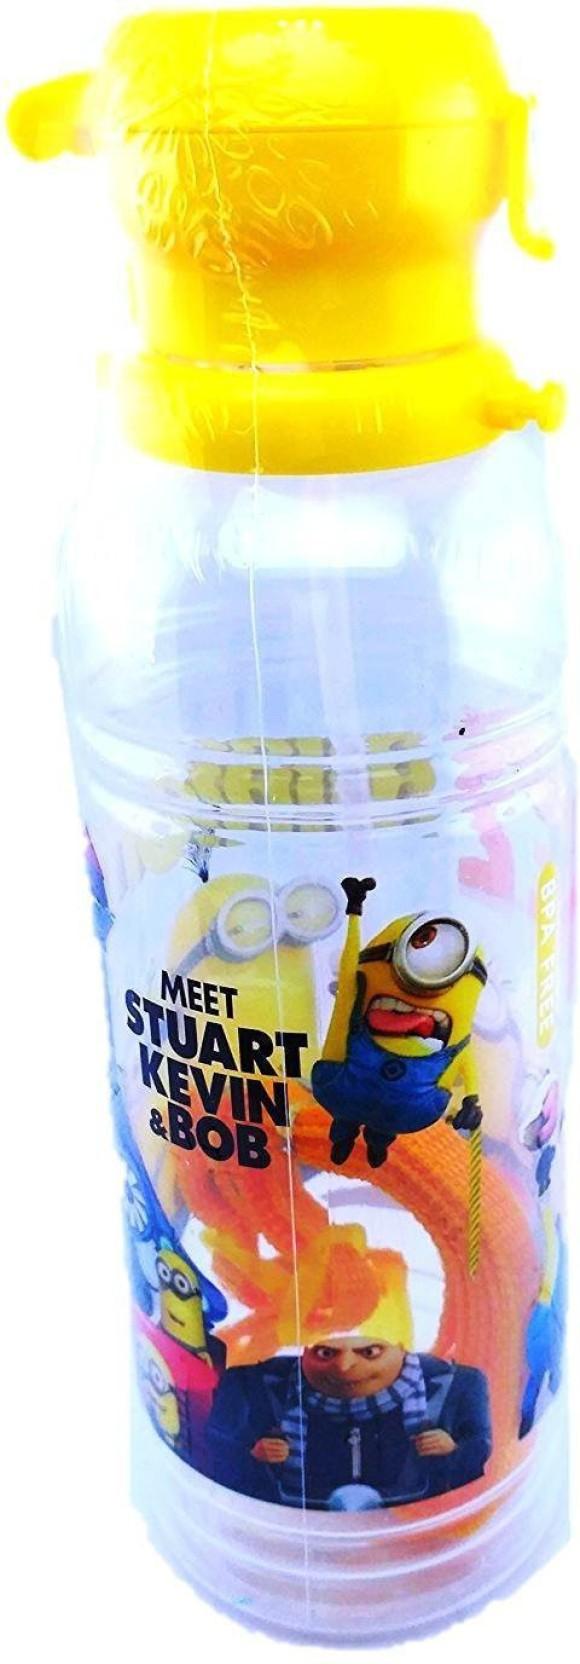 3e14d13e2e Oytra Minion BPA Free Unbreakable Transparent Sipper Bottle 550 ml Water  Bottle. ADD TO CART